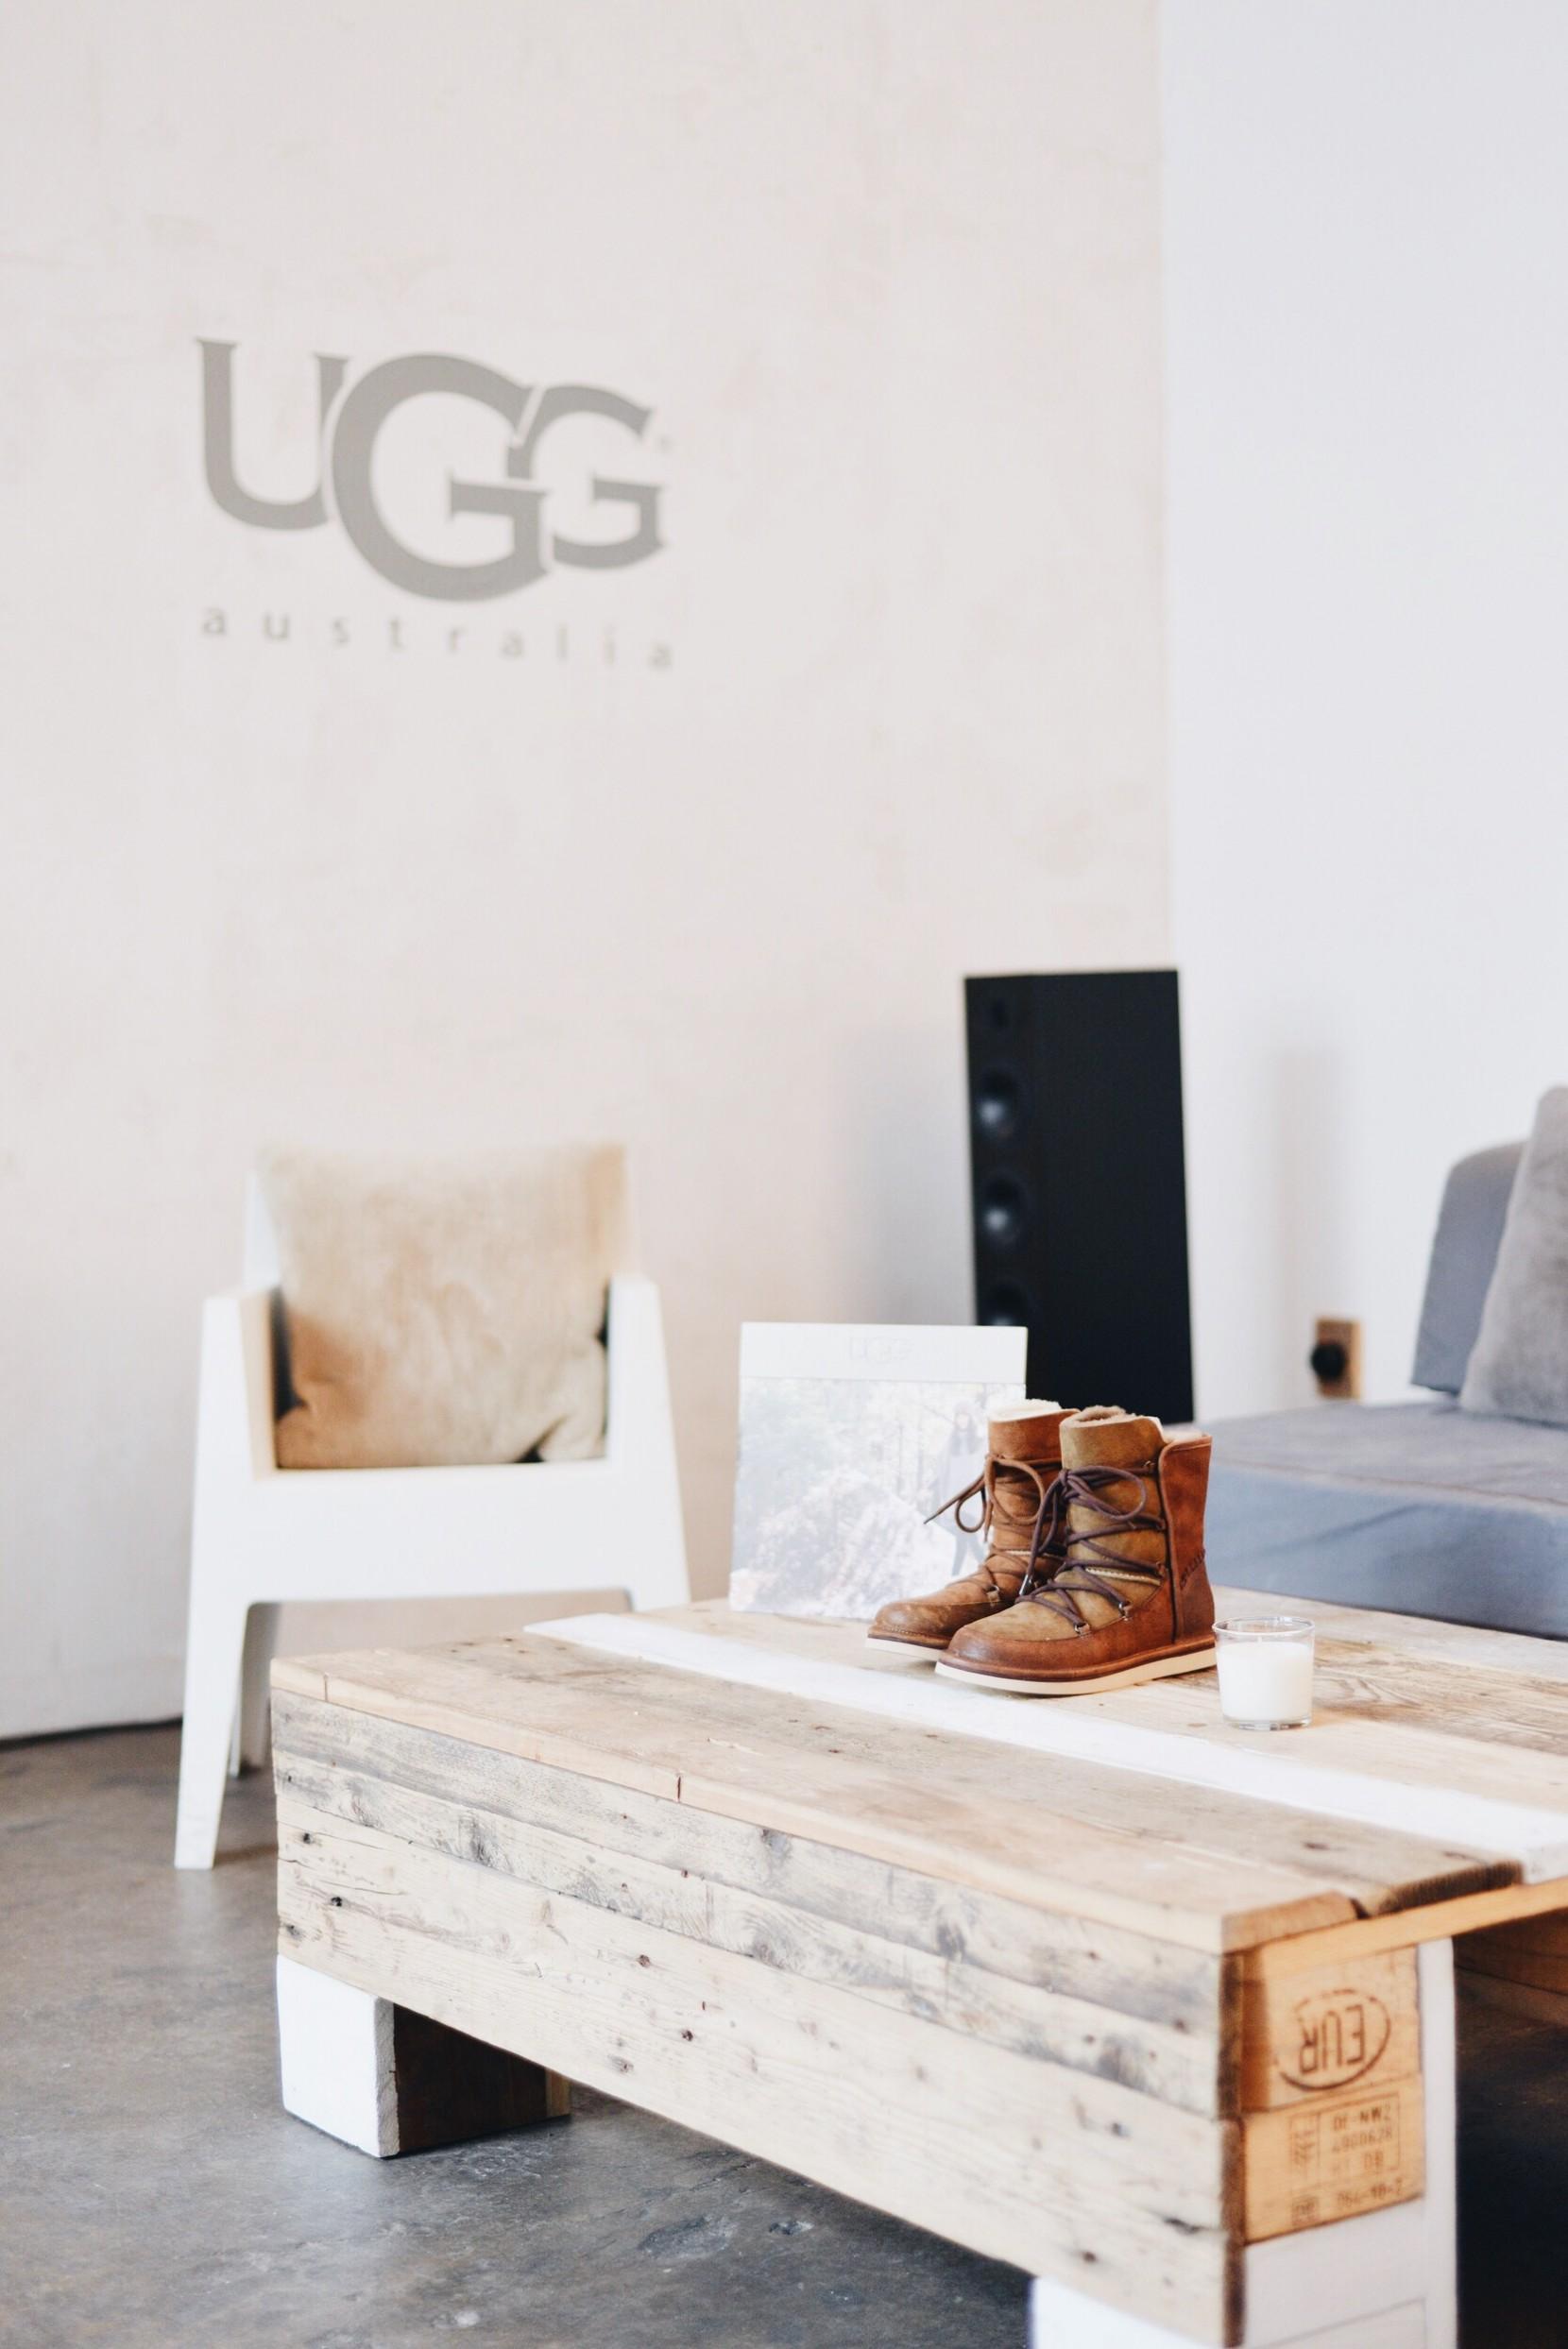 UGG Australia Creative Hub in Berlin + Verlosung